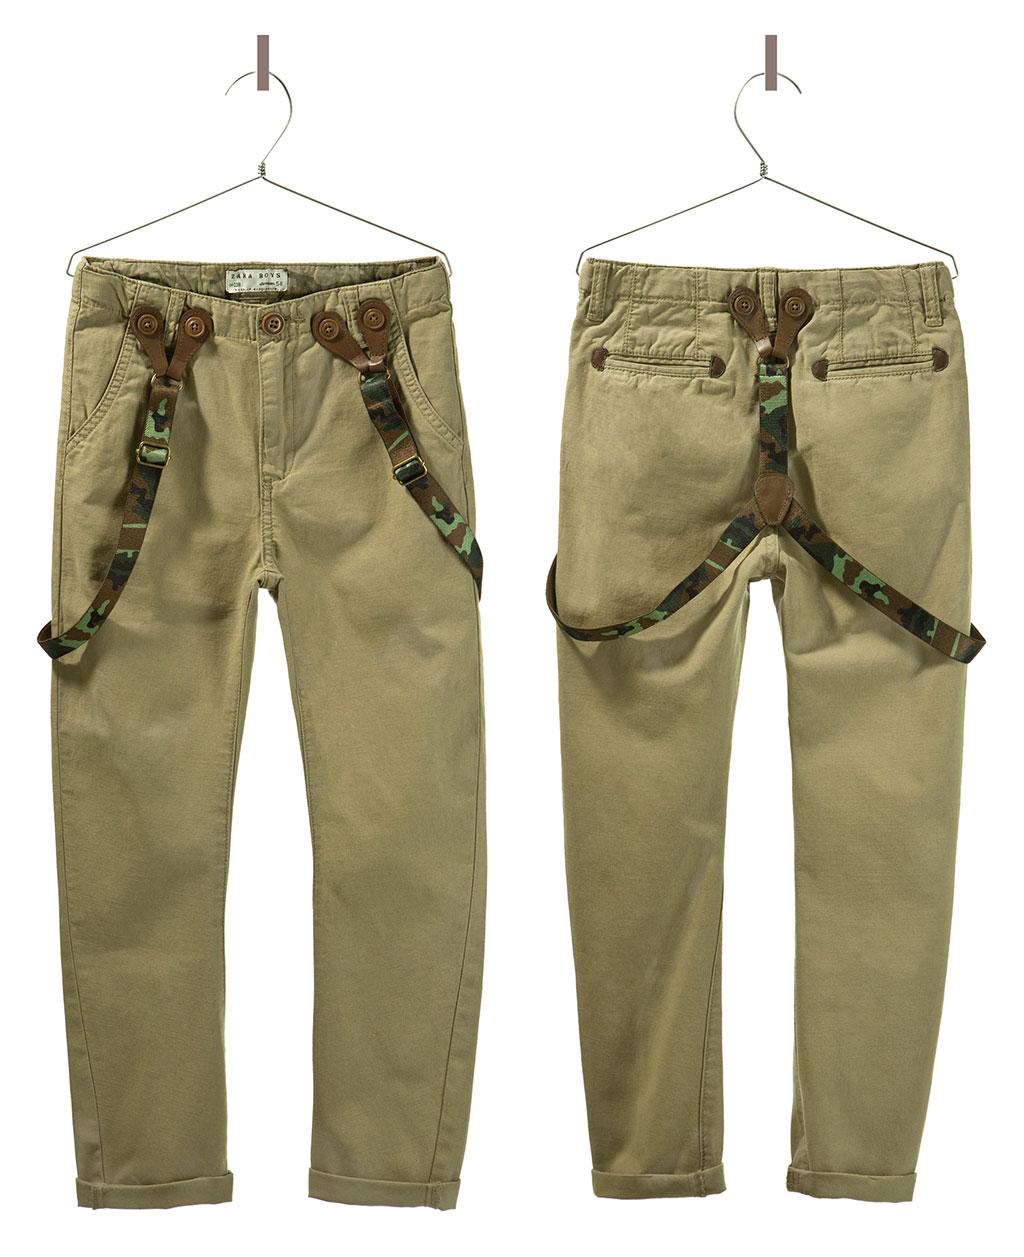 Zara-Camouflage-Suspenders-Chinos